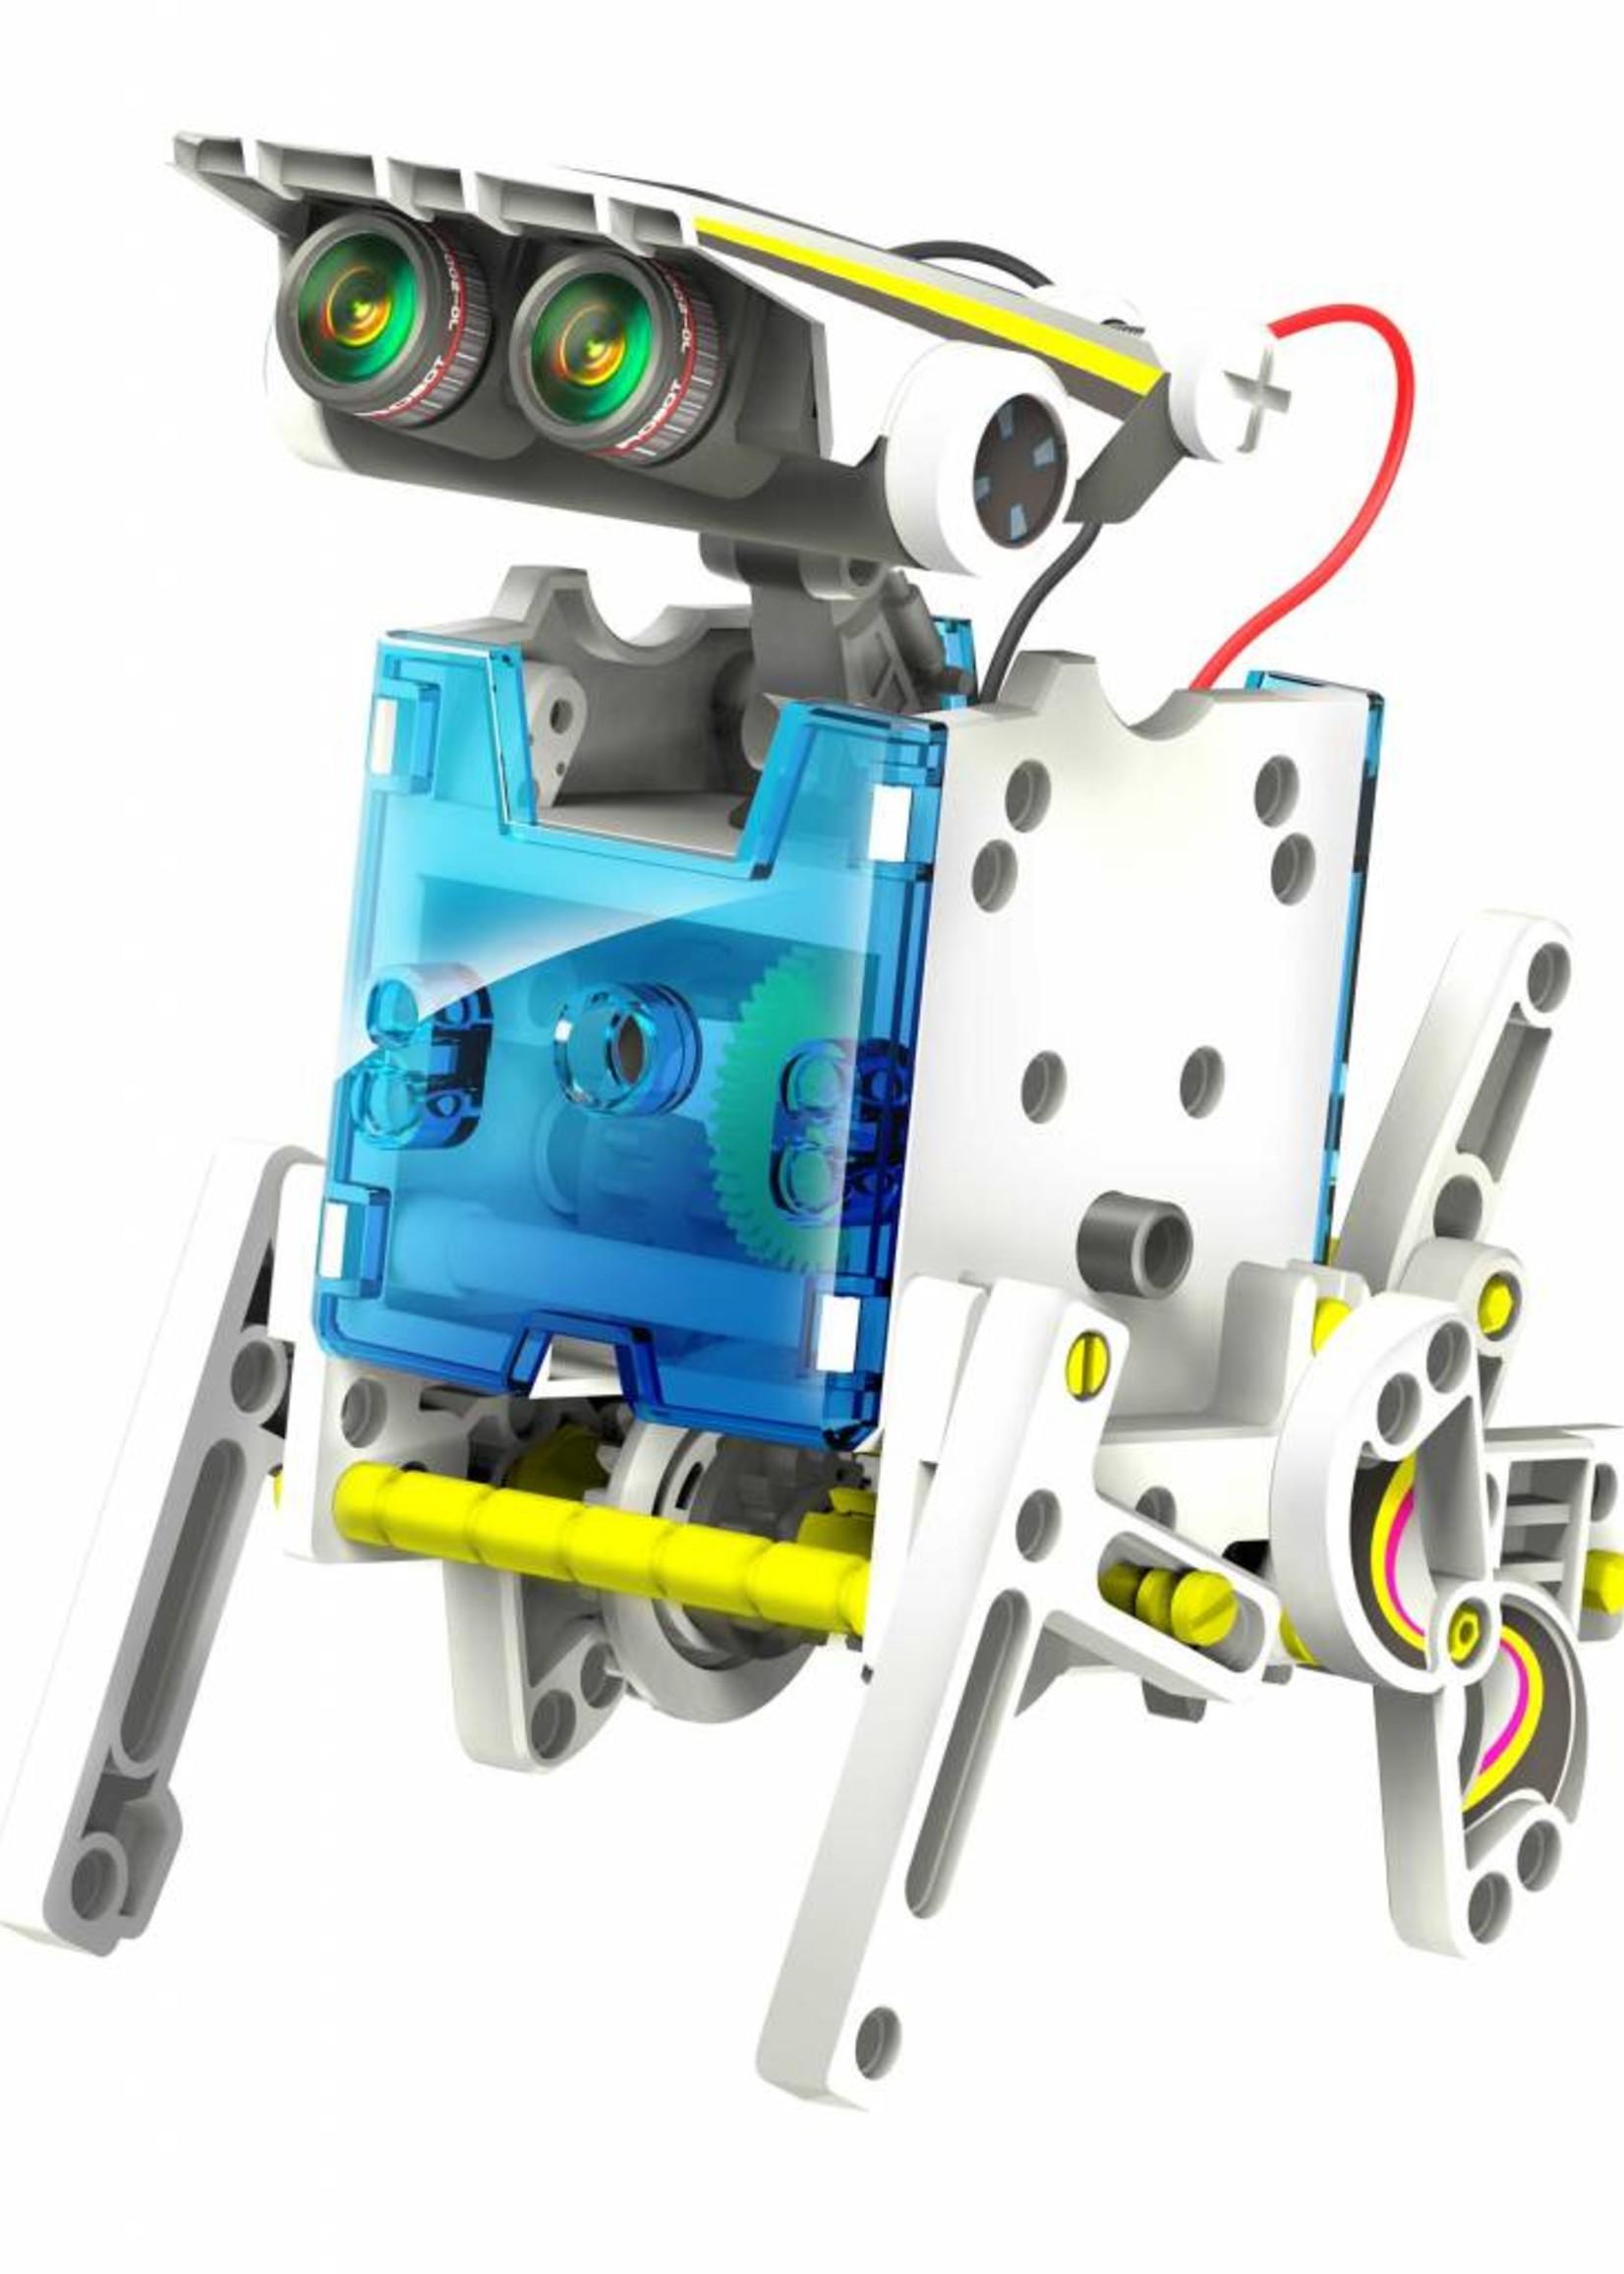 DIY 14 in 1 Solar robot